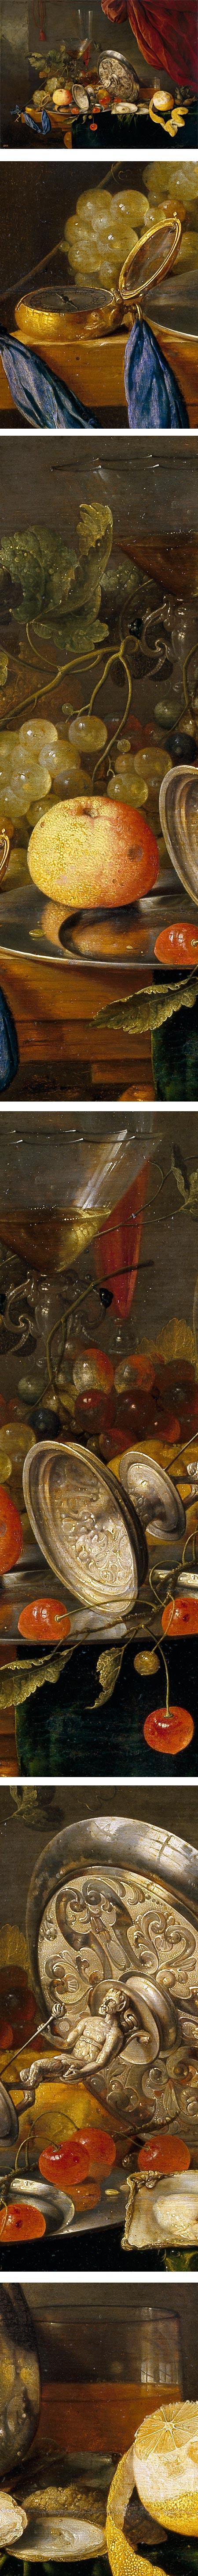 Mesa (Table), Jan Davidsz de Heem